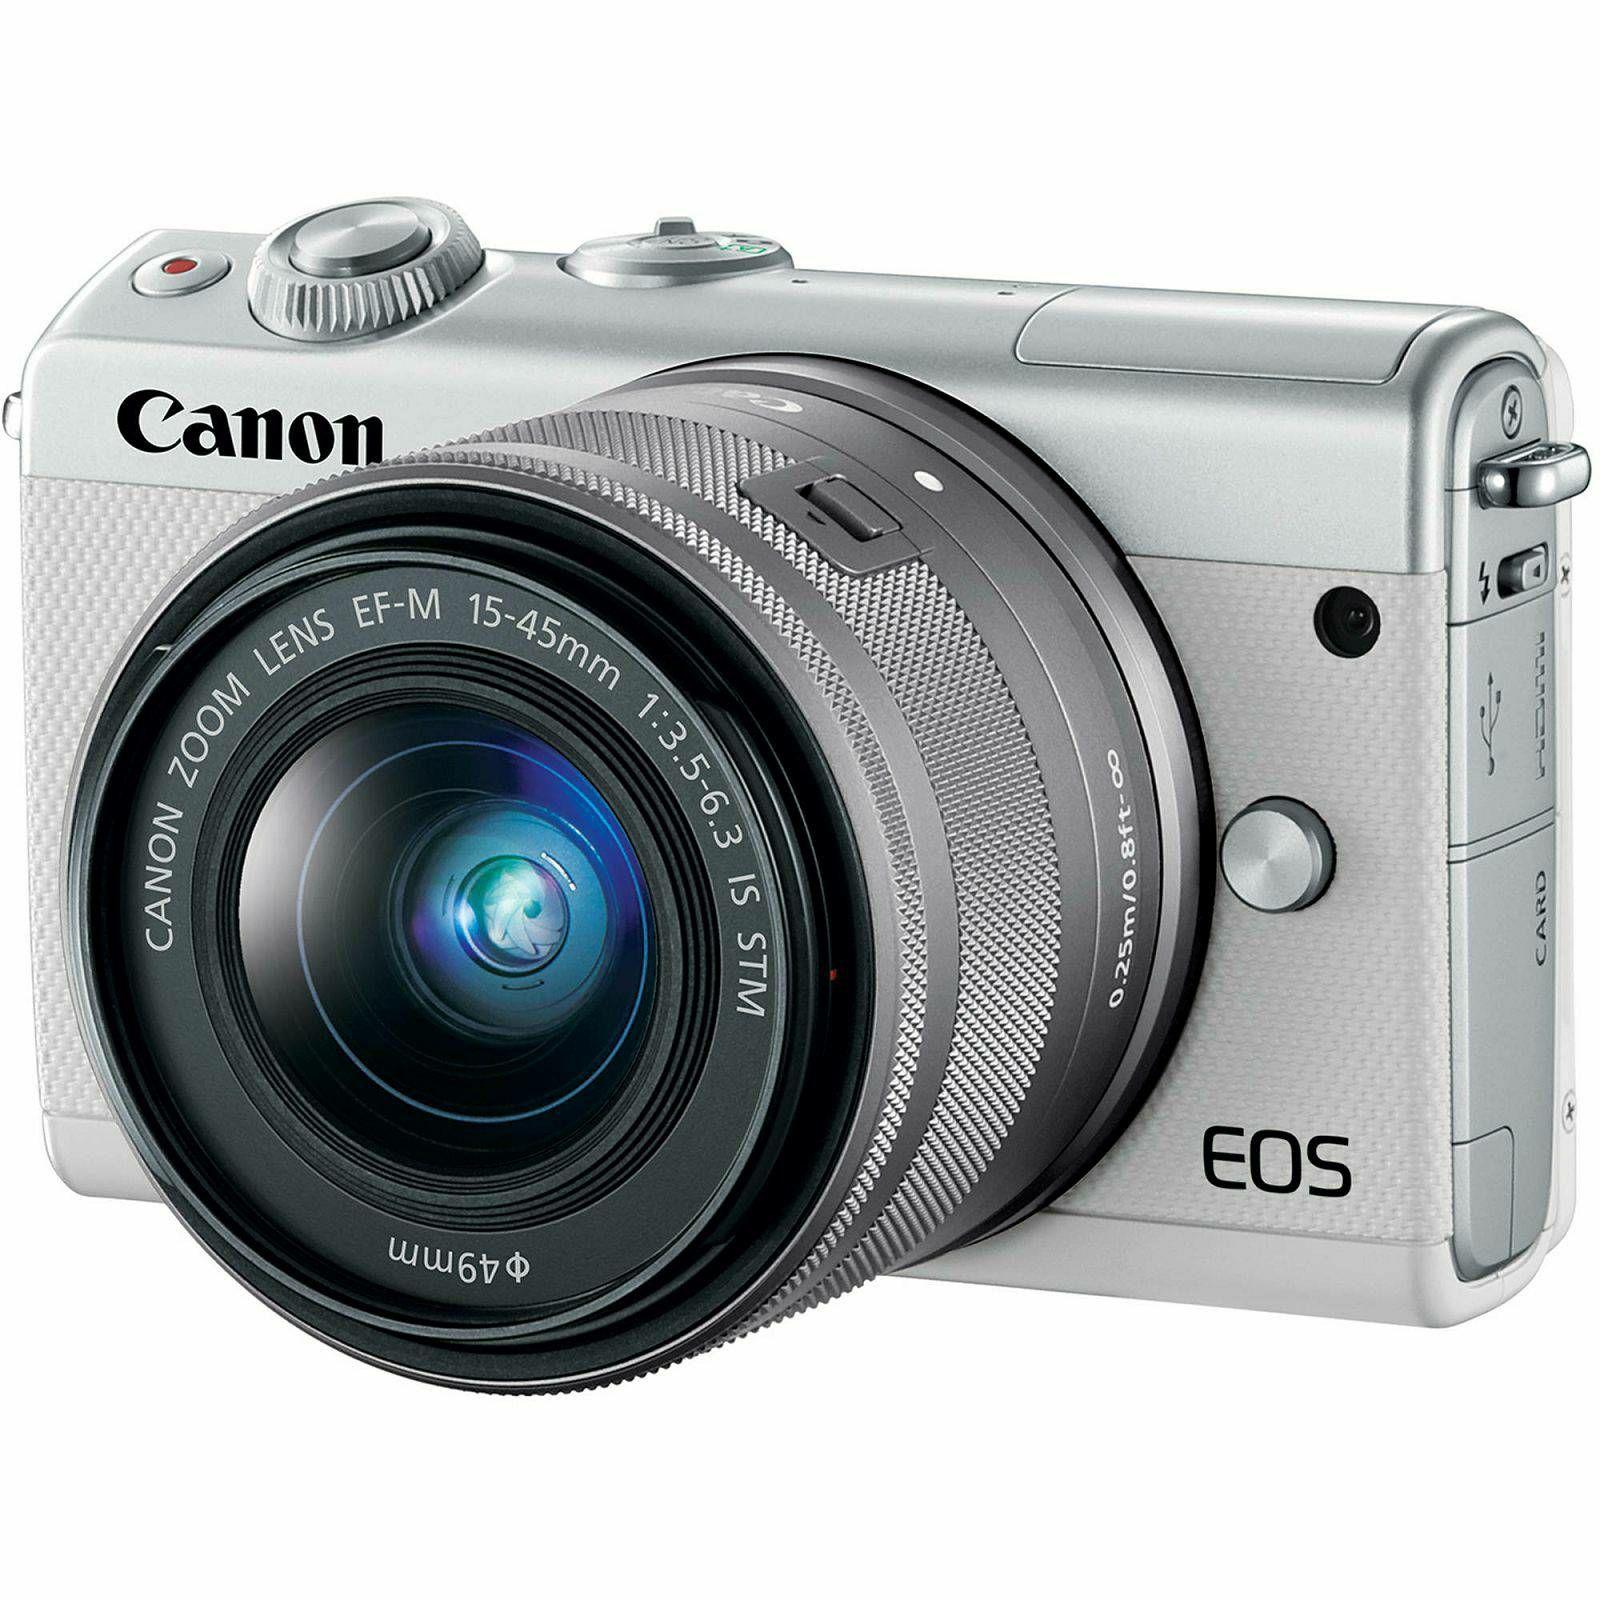 Canon EOS M100 + 15-45 IS STM + 22mm STM White Mirrorless Digitalni fotoaparat EF-M 15-45mm 3.5-6.3 i EF-M 22mm f/2 F2 F2.0 (2210C032AA) - CASH BACK promocija povrat novca u iznosu 300 kn